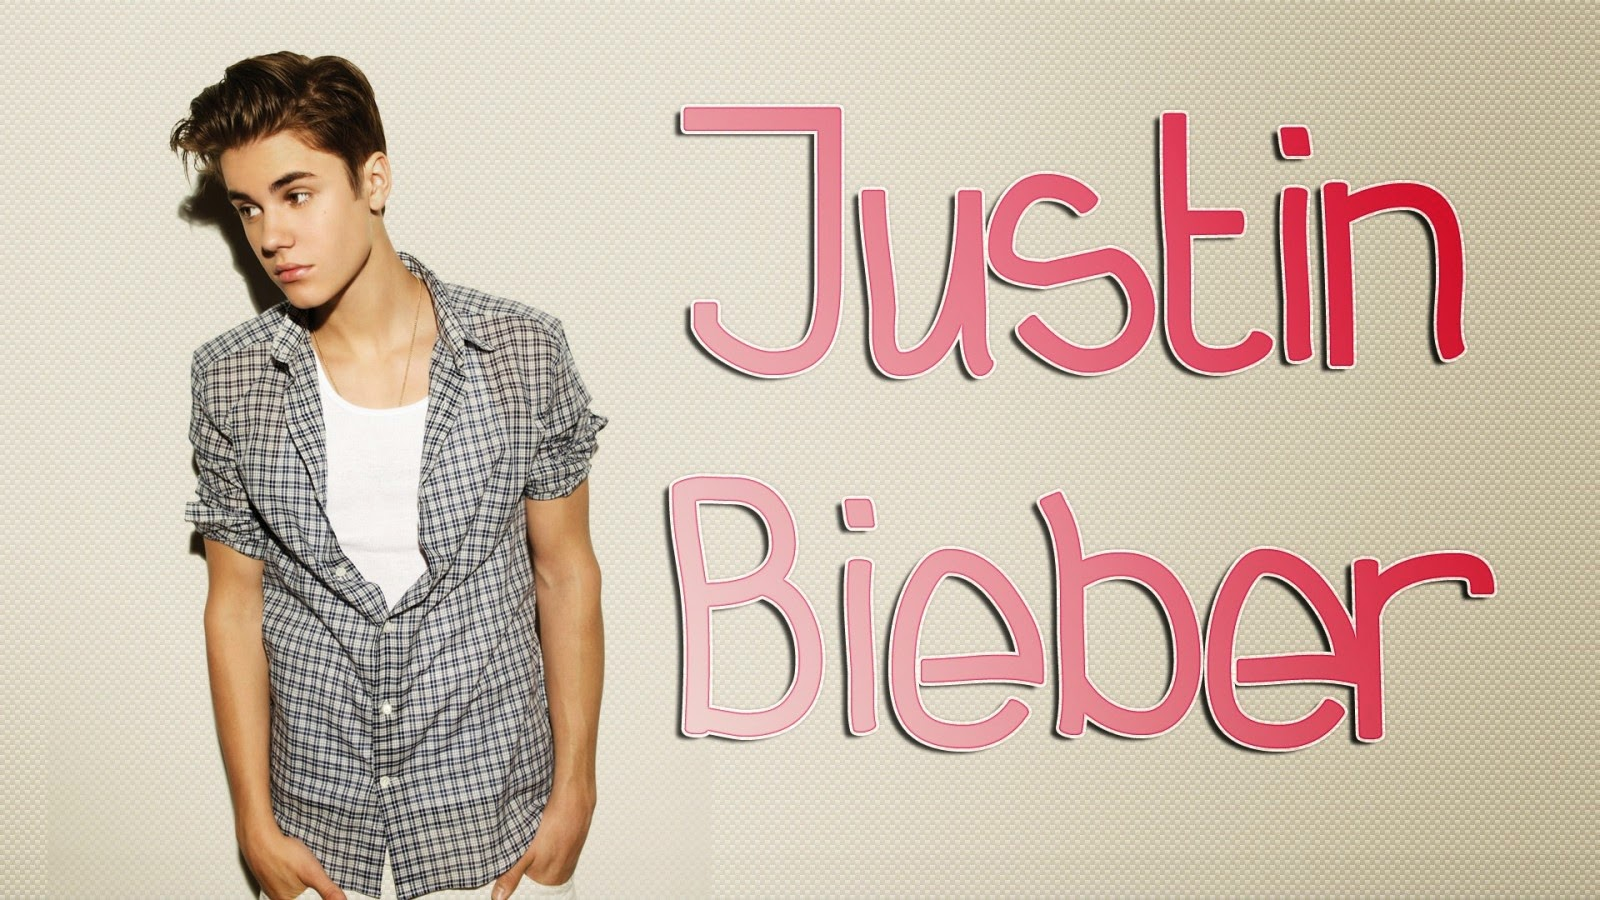 Justin Bieber 2013 Cool Wallpaper: Justin Bieber Wallpapers